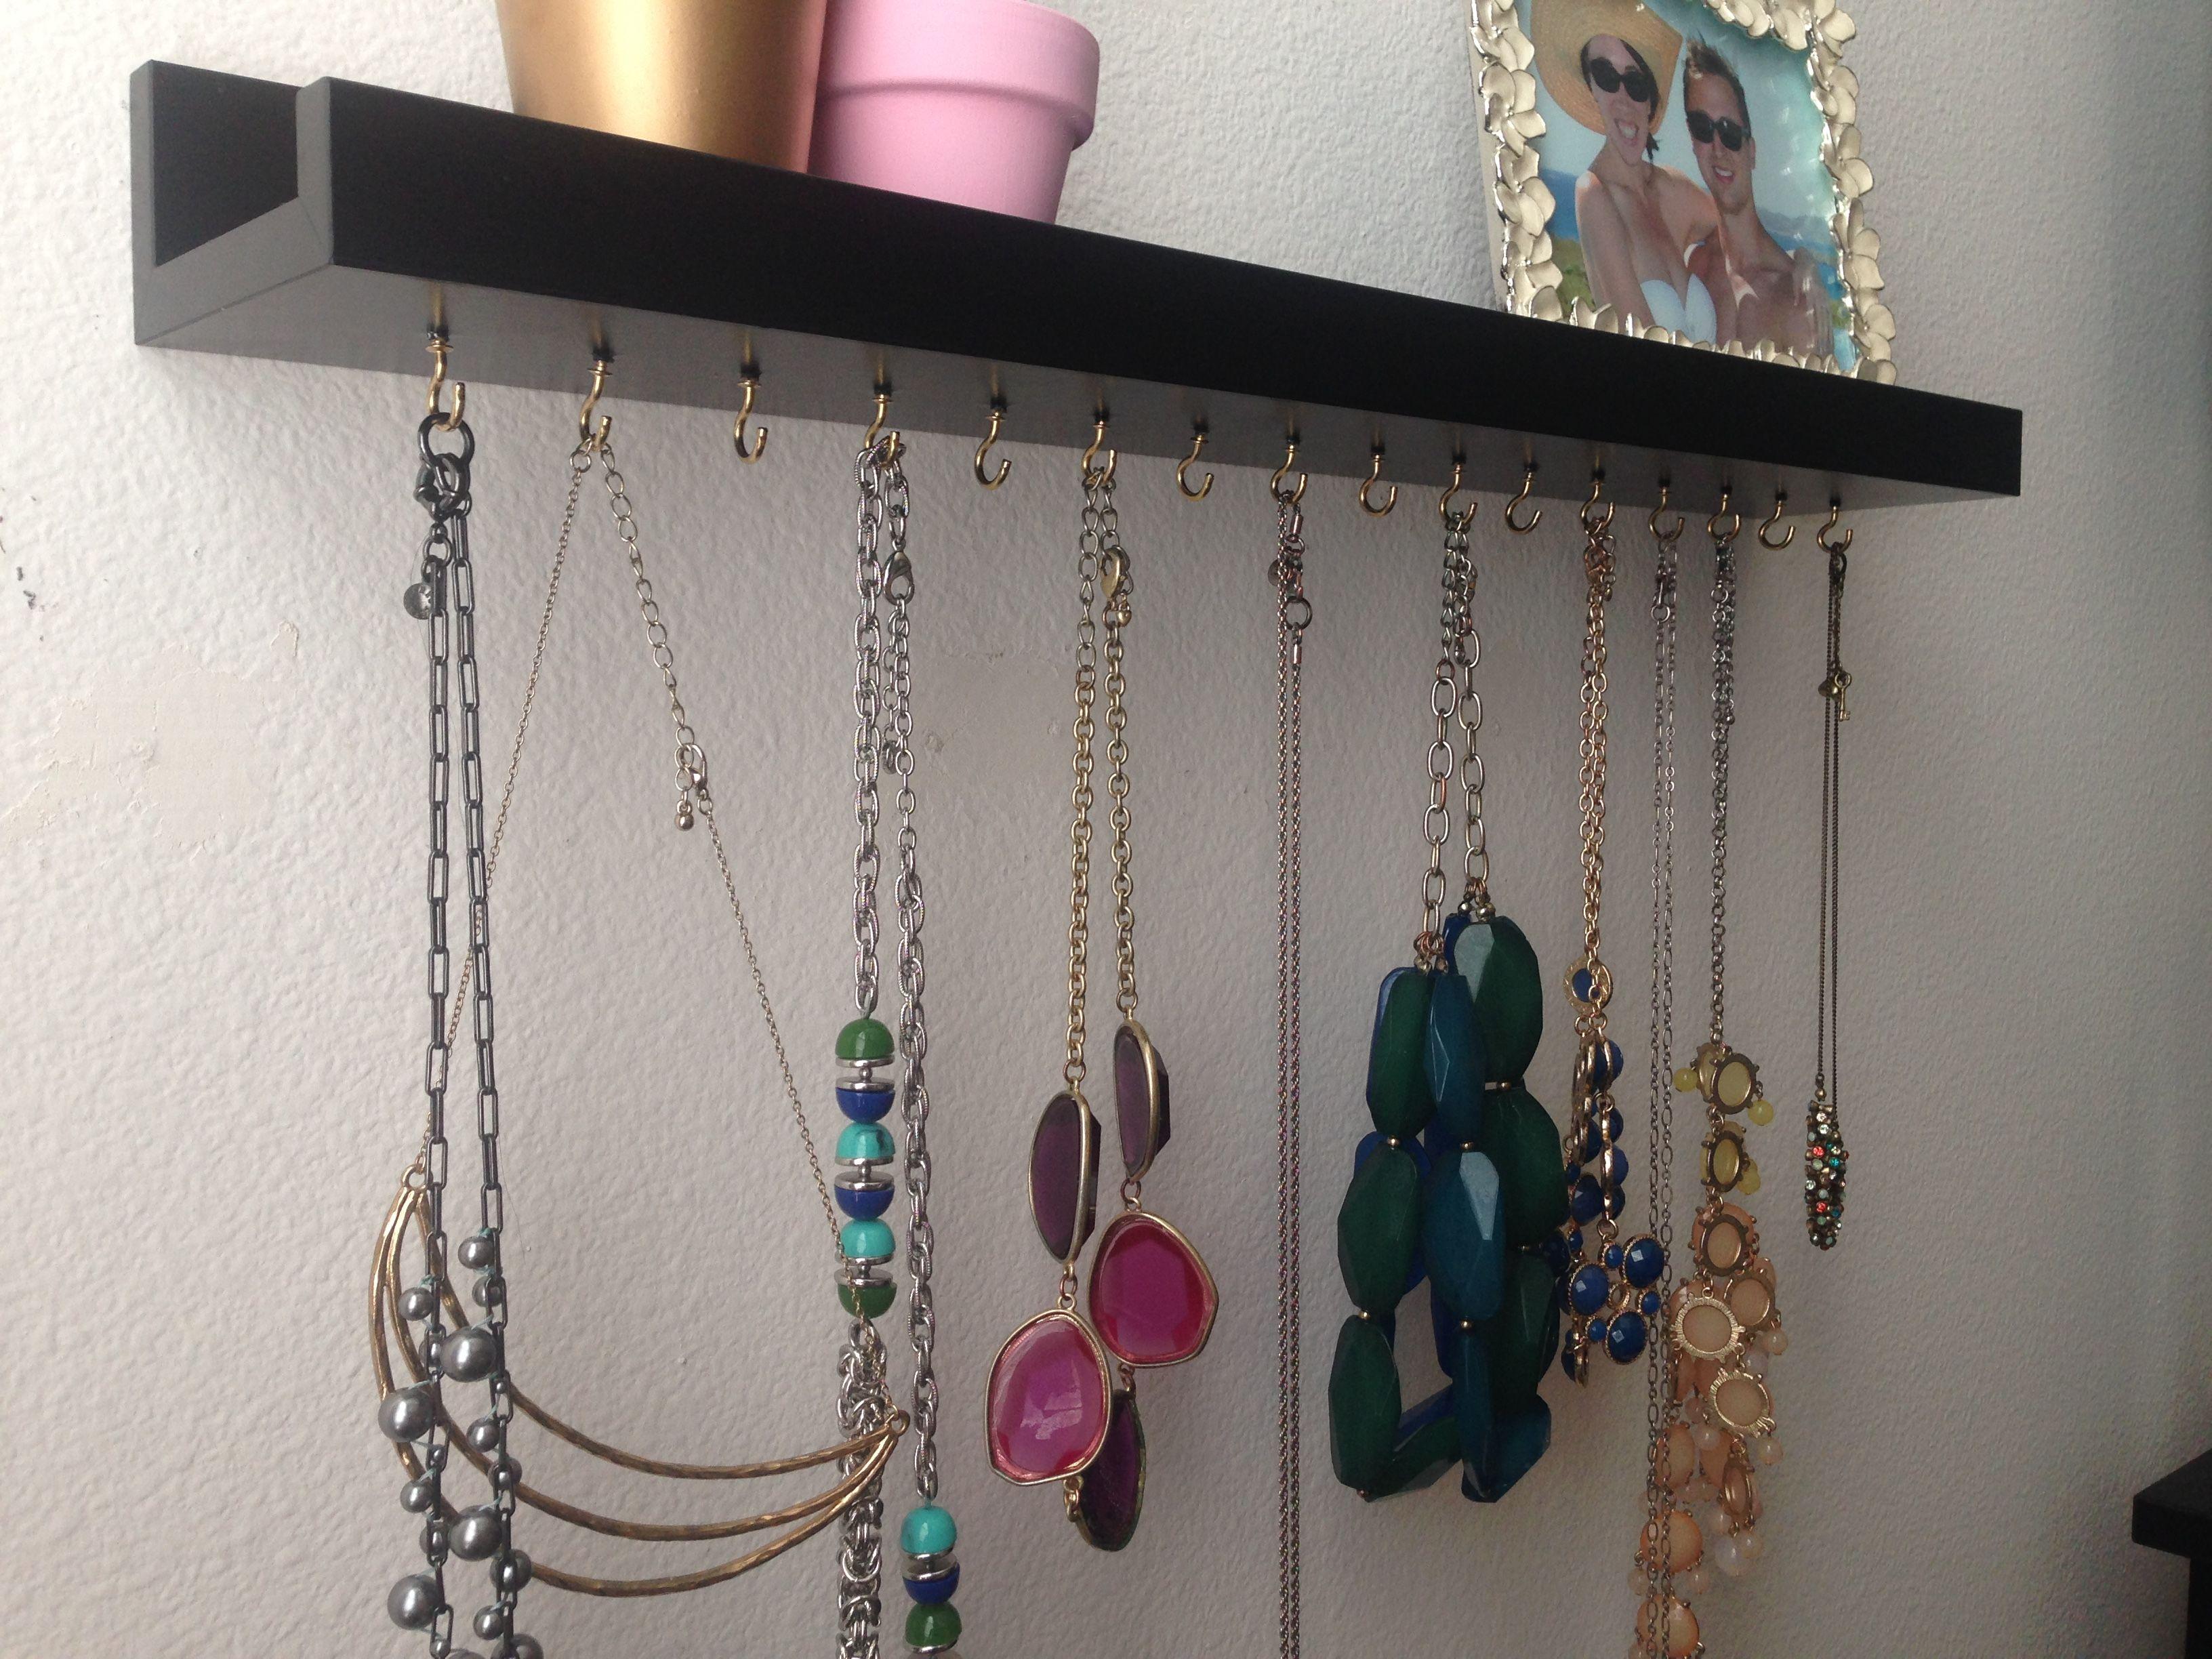 DIY Necklace Hanger Necklace Organizer Necklace Shelf Jewelry IKEA